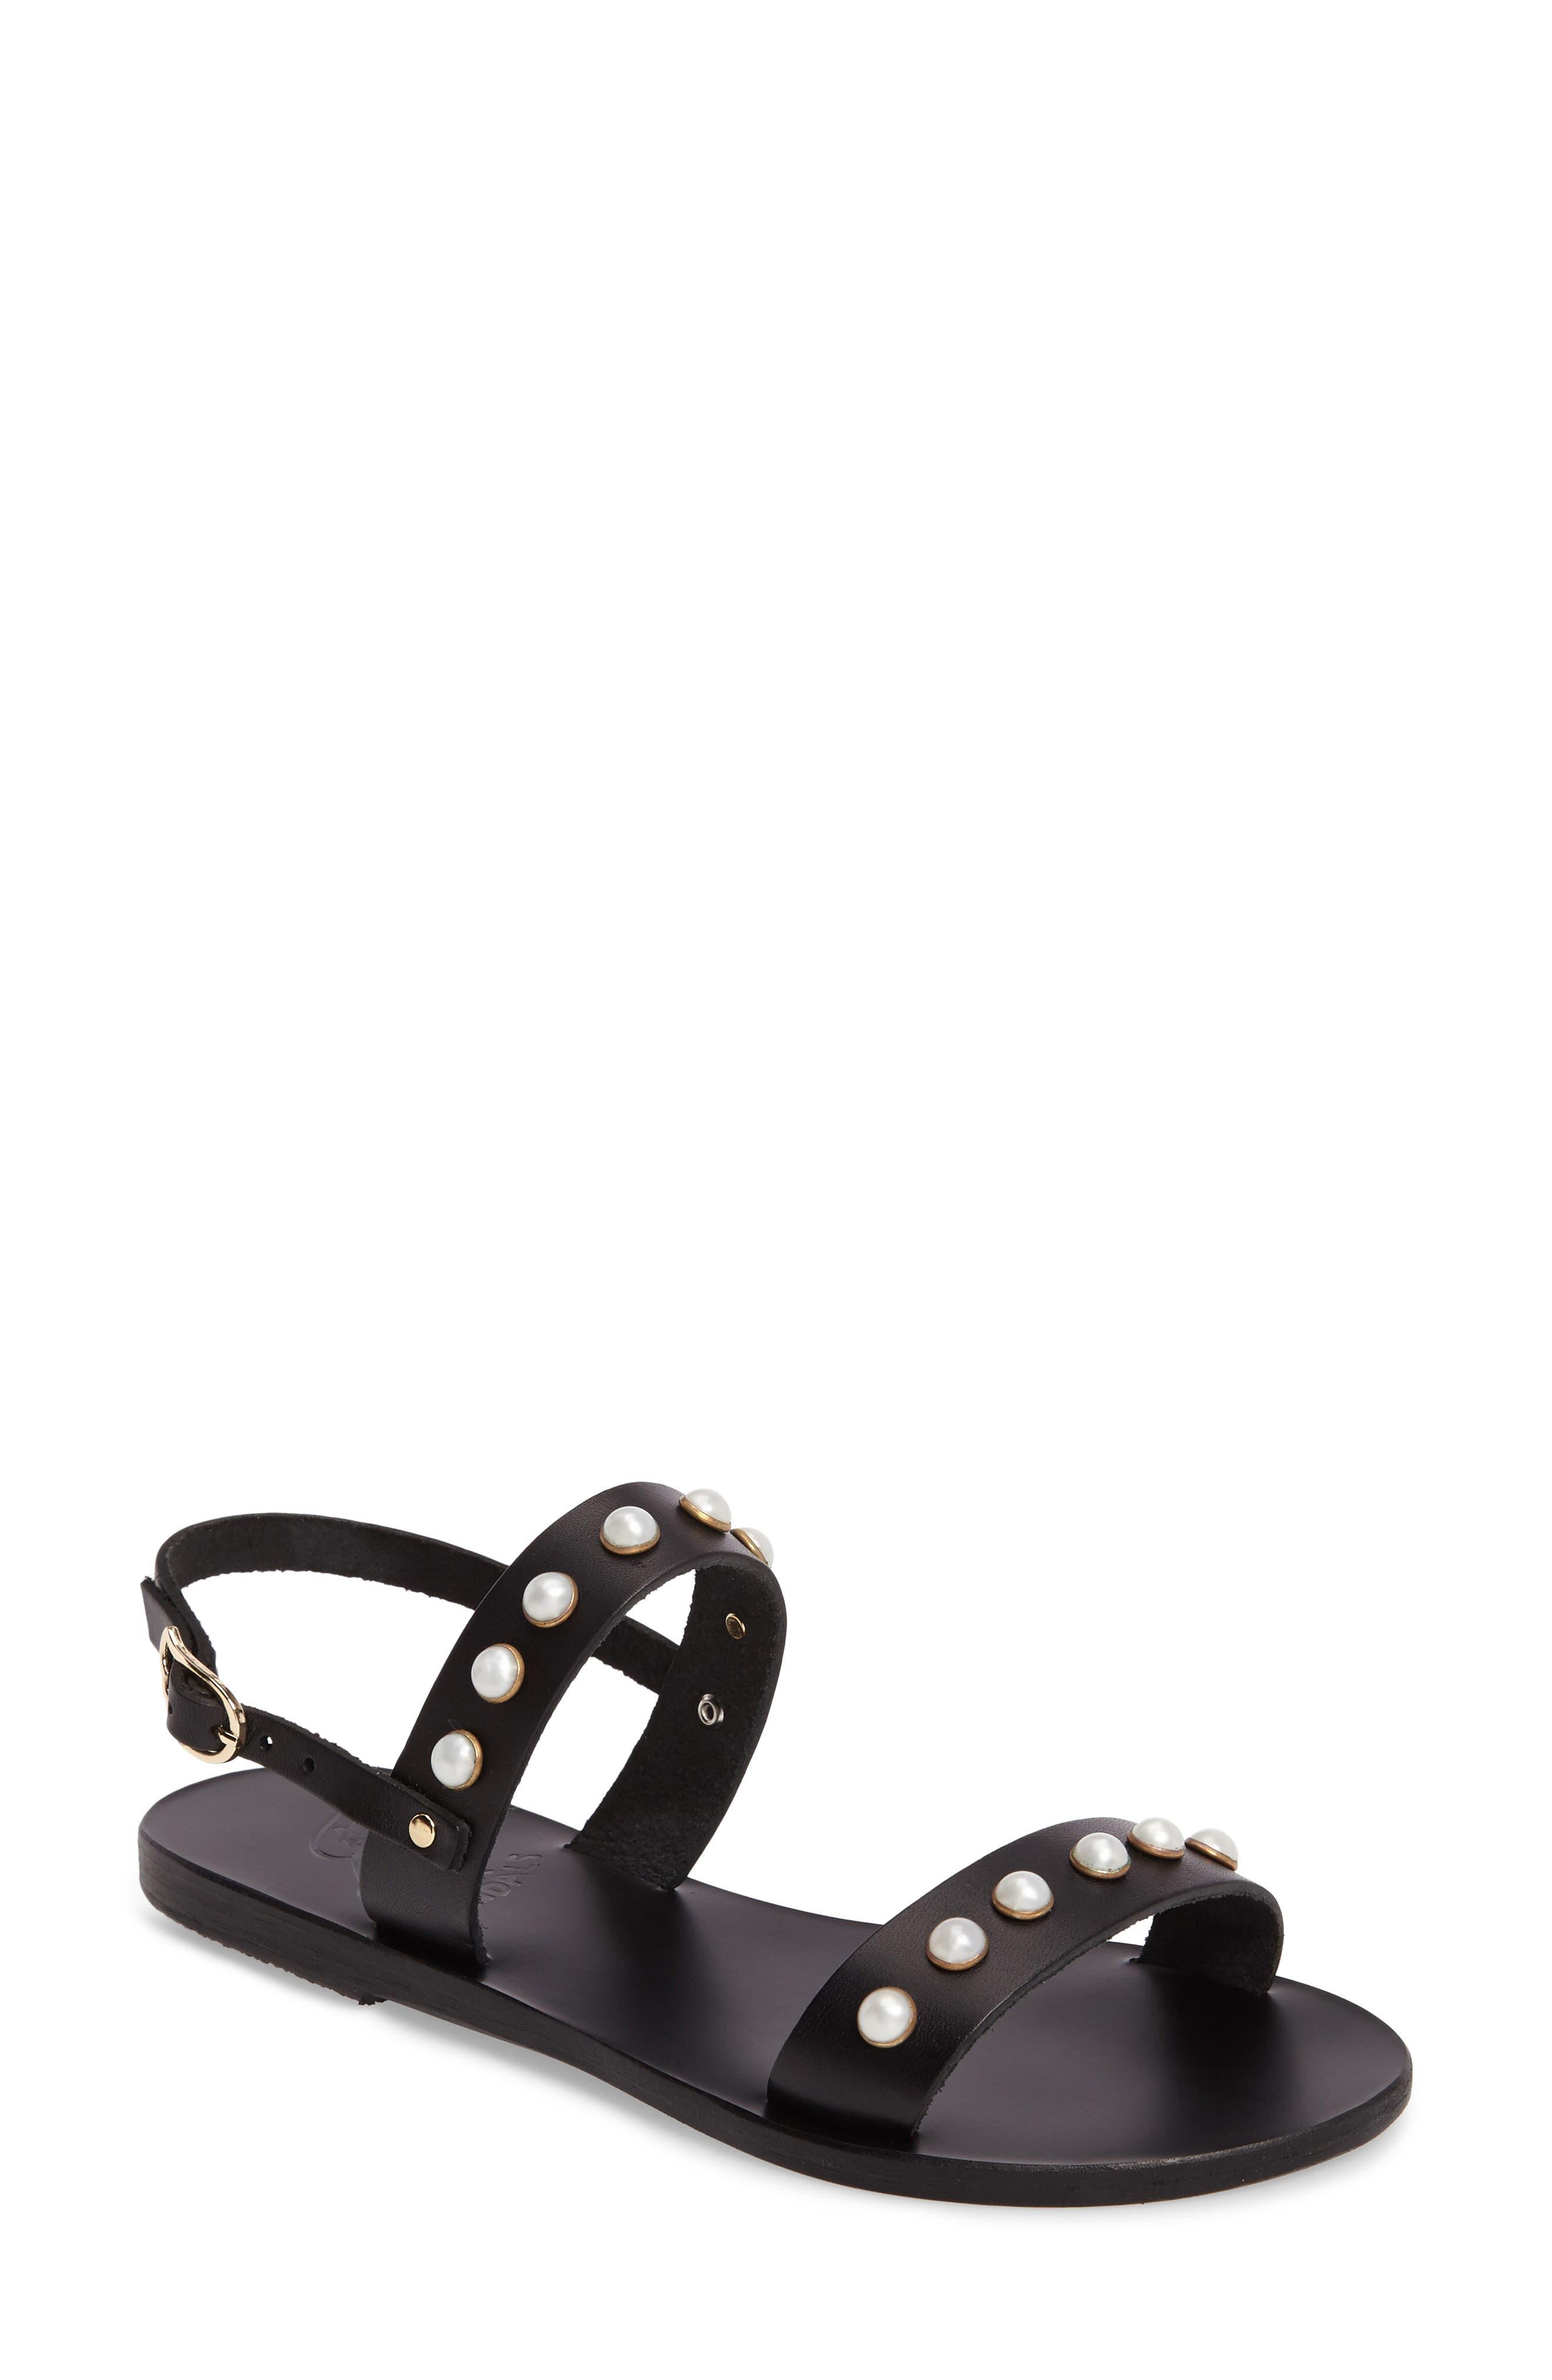 Clio Sandal,                         Main,                         color,